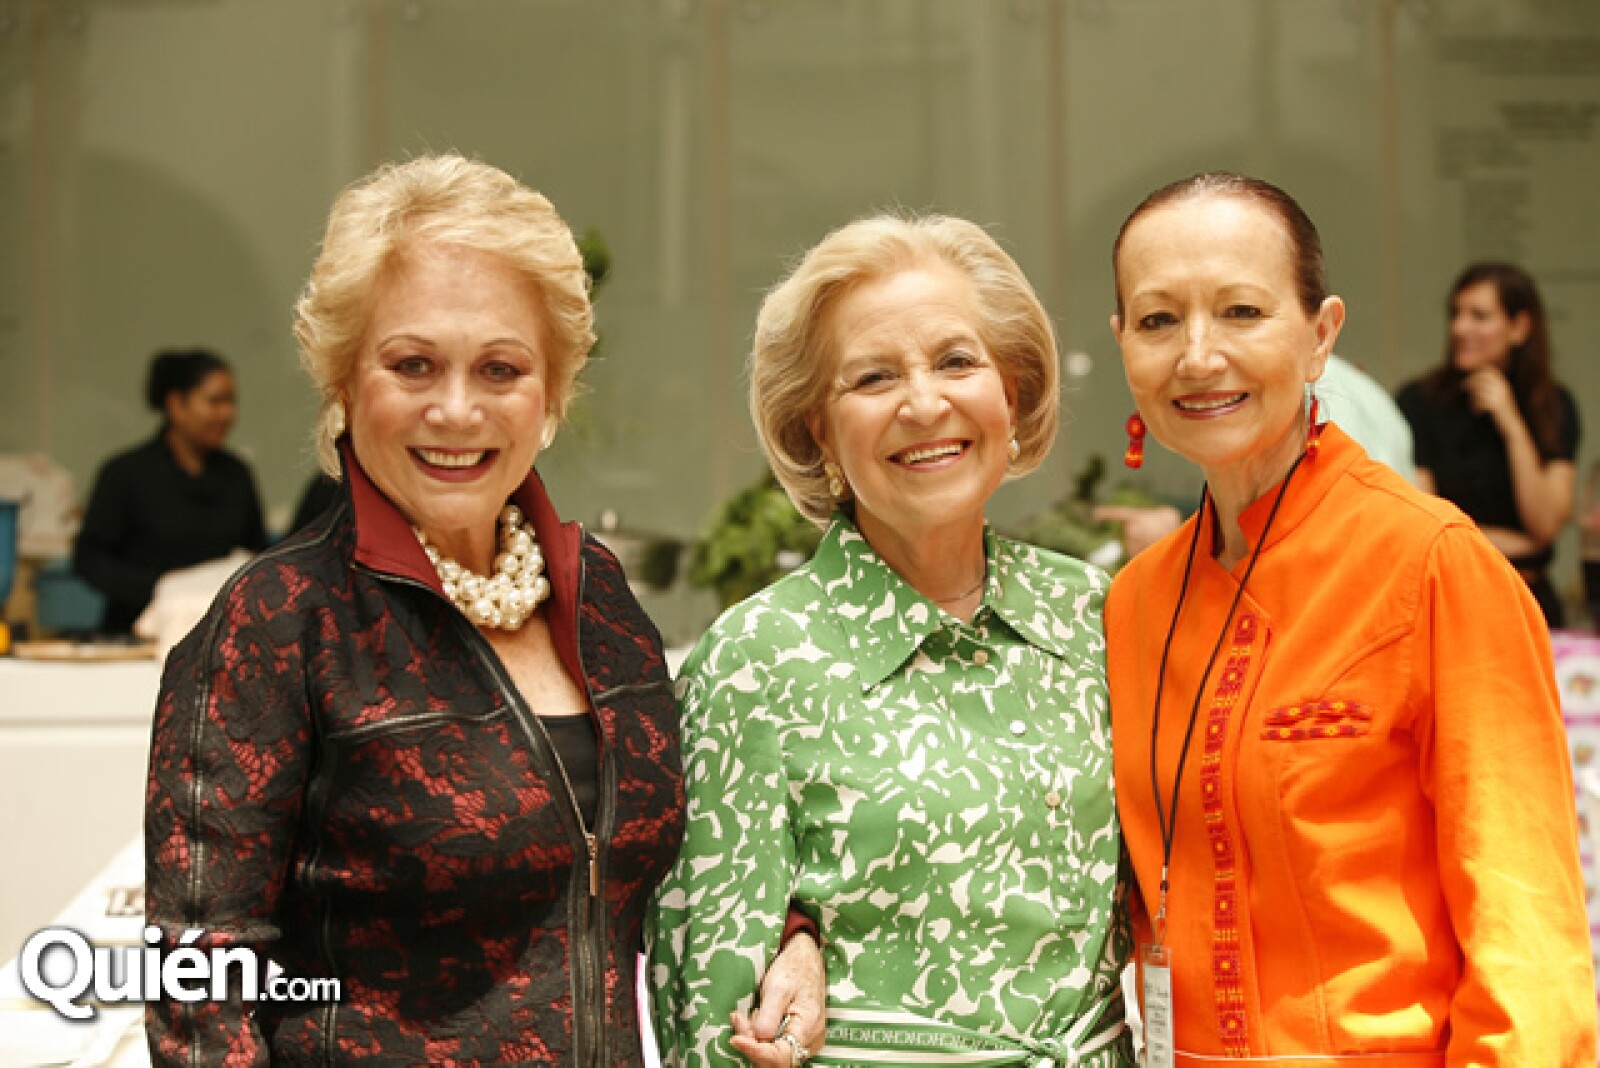 Estela de Piotti, Cristina Beltrán y Patricia Quintana